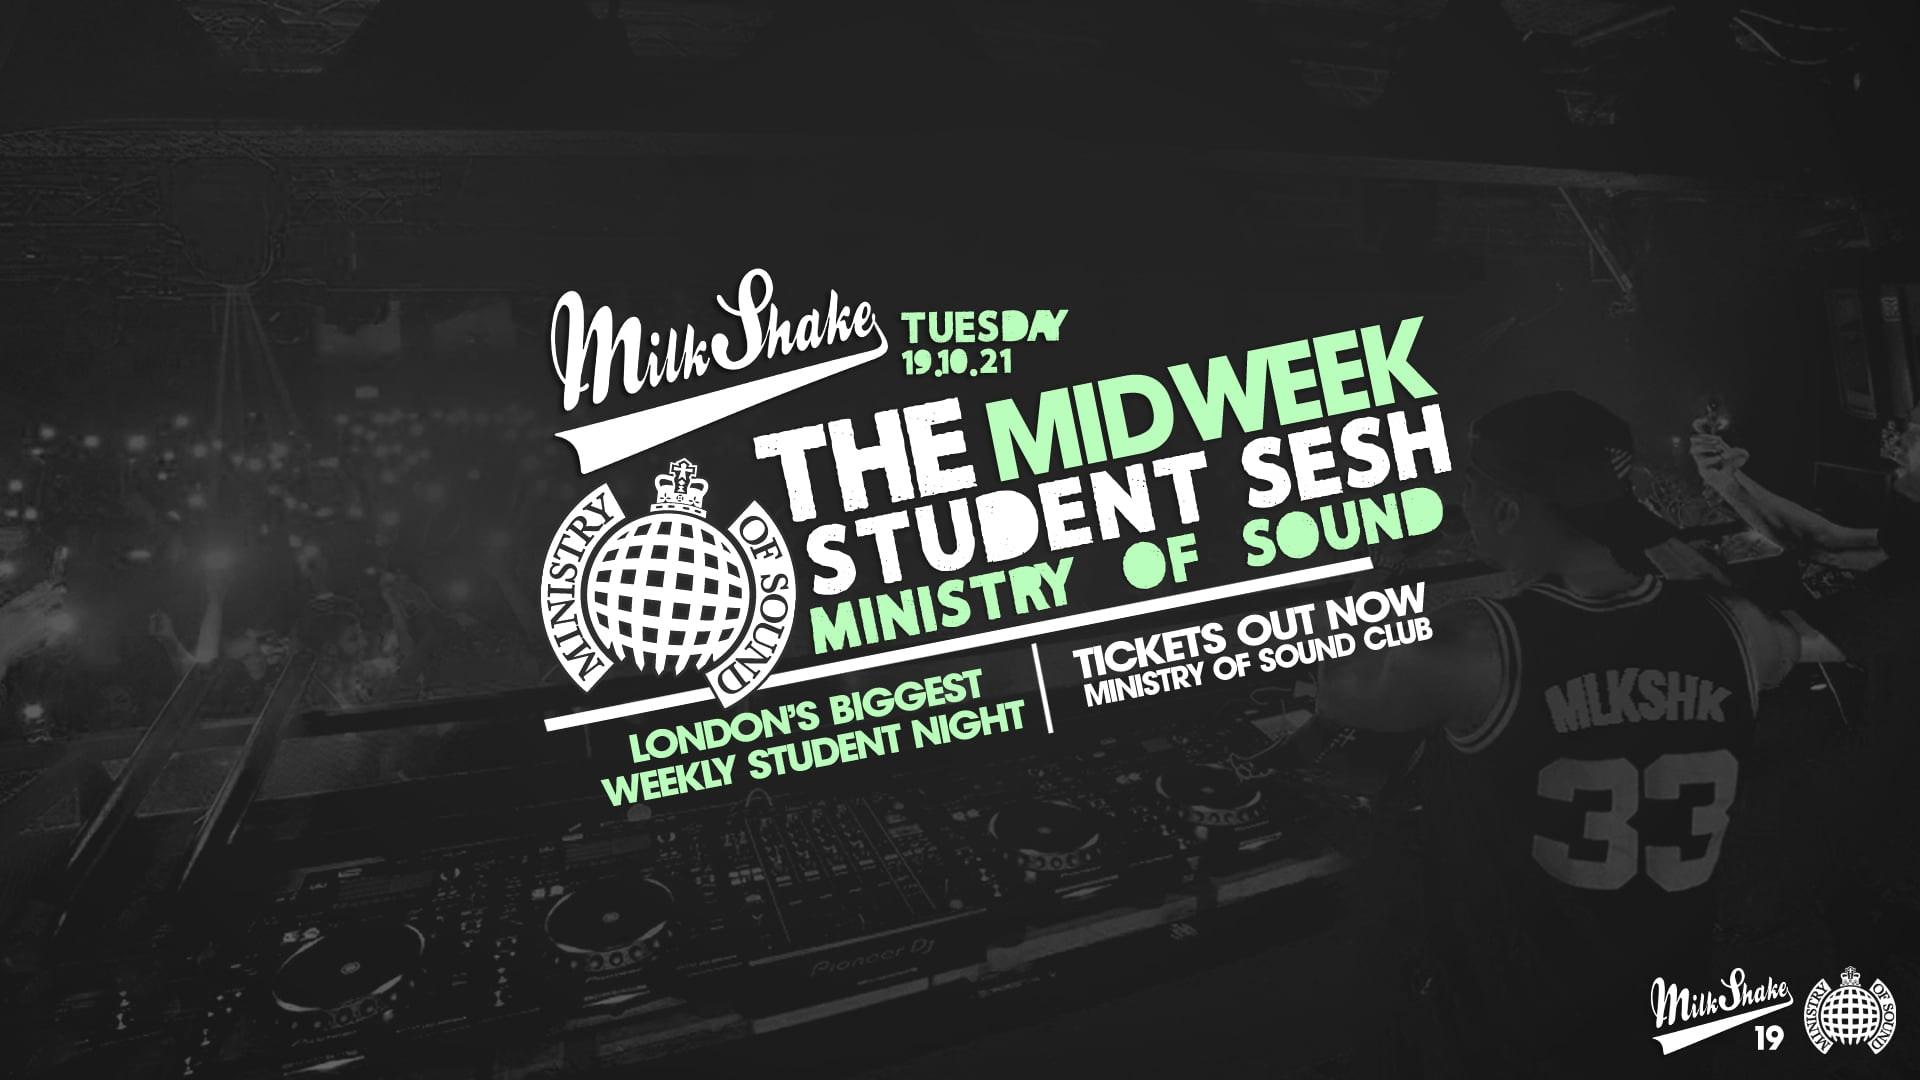 Milkshake, Ministry of Sound | London's Biggest Student Night – October 19th 2021 🔥